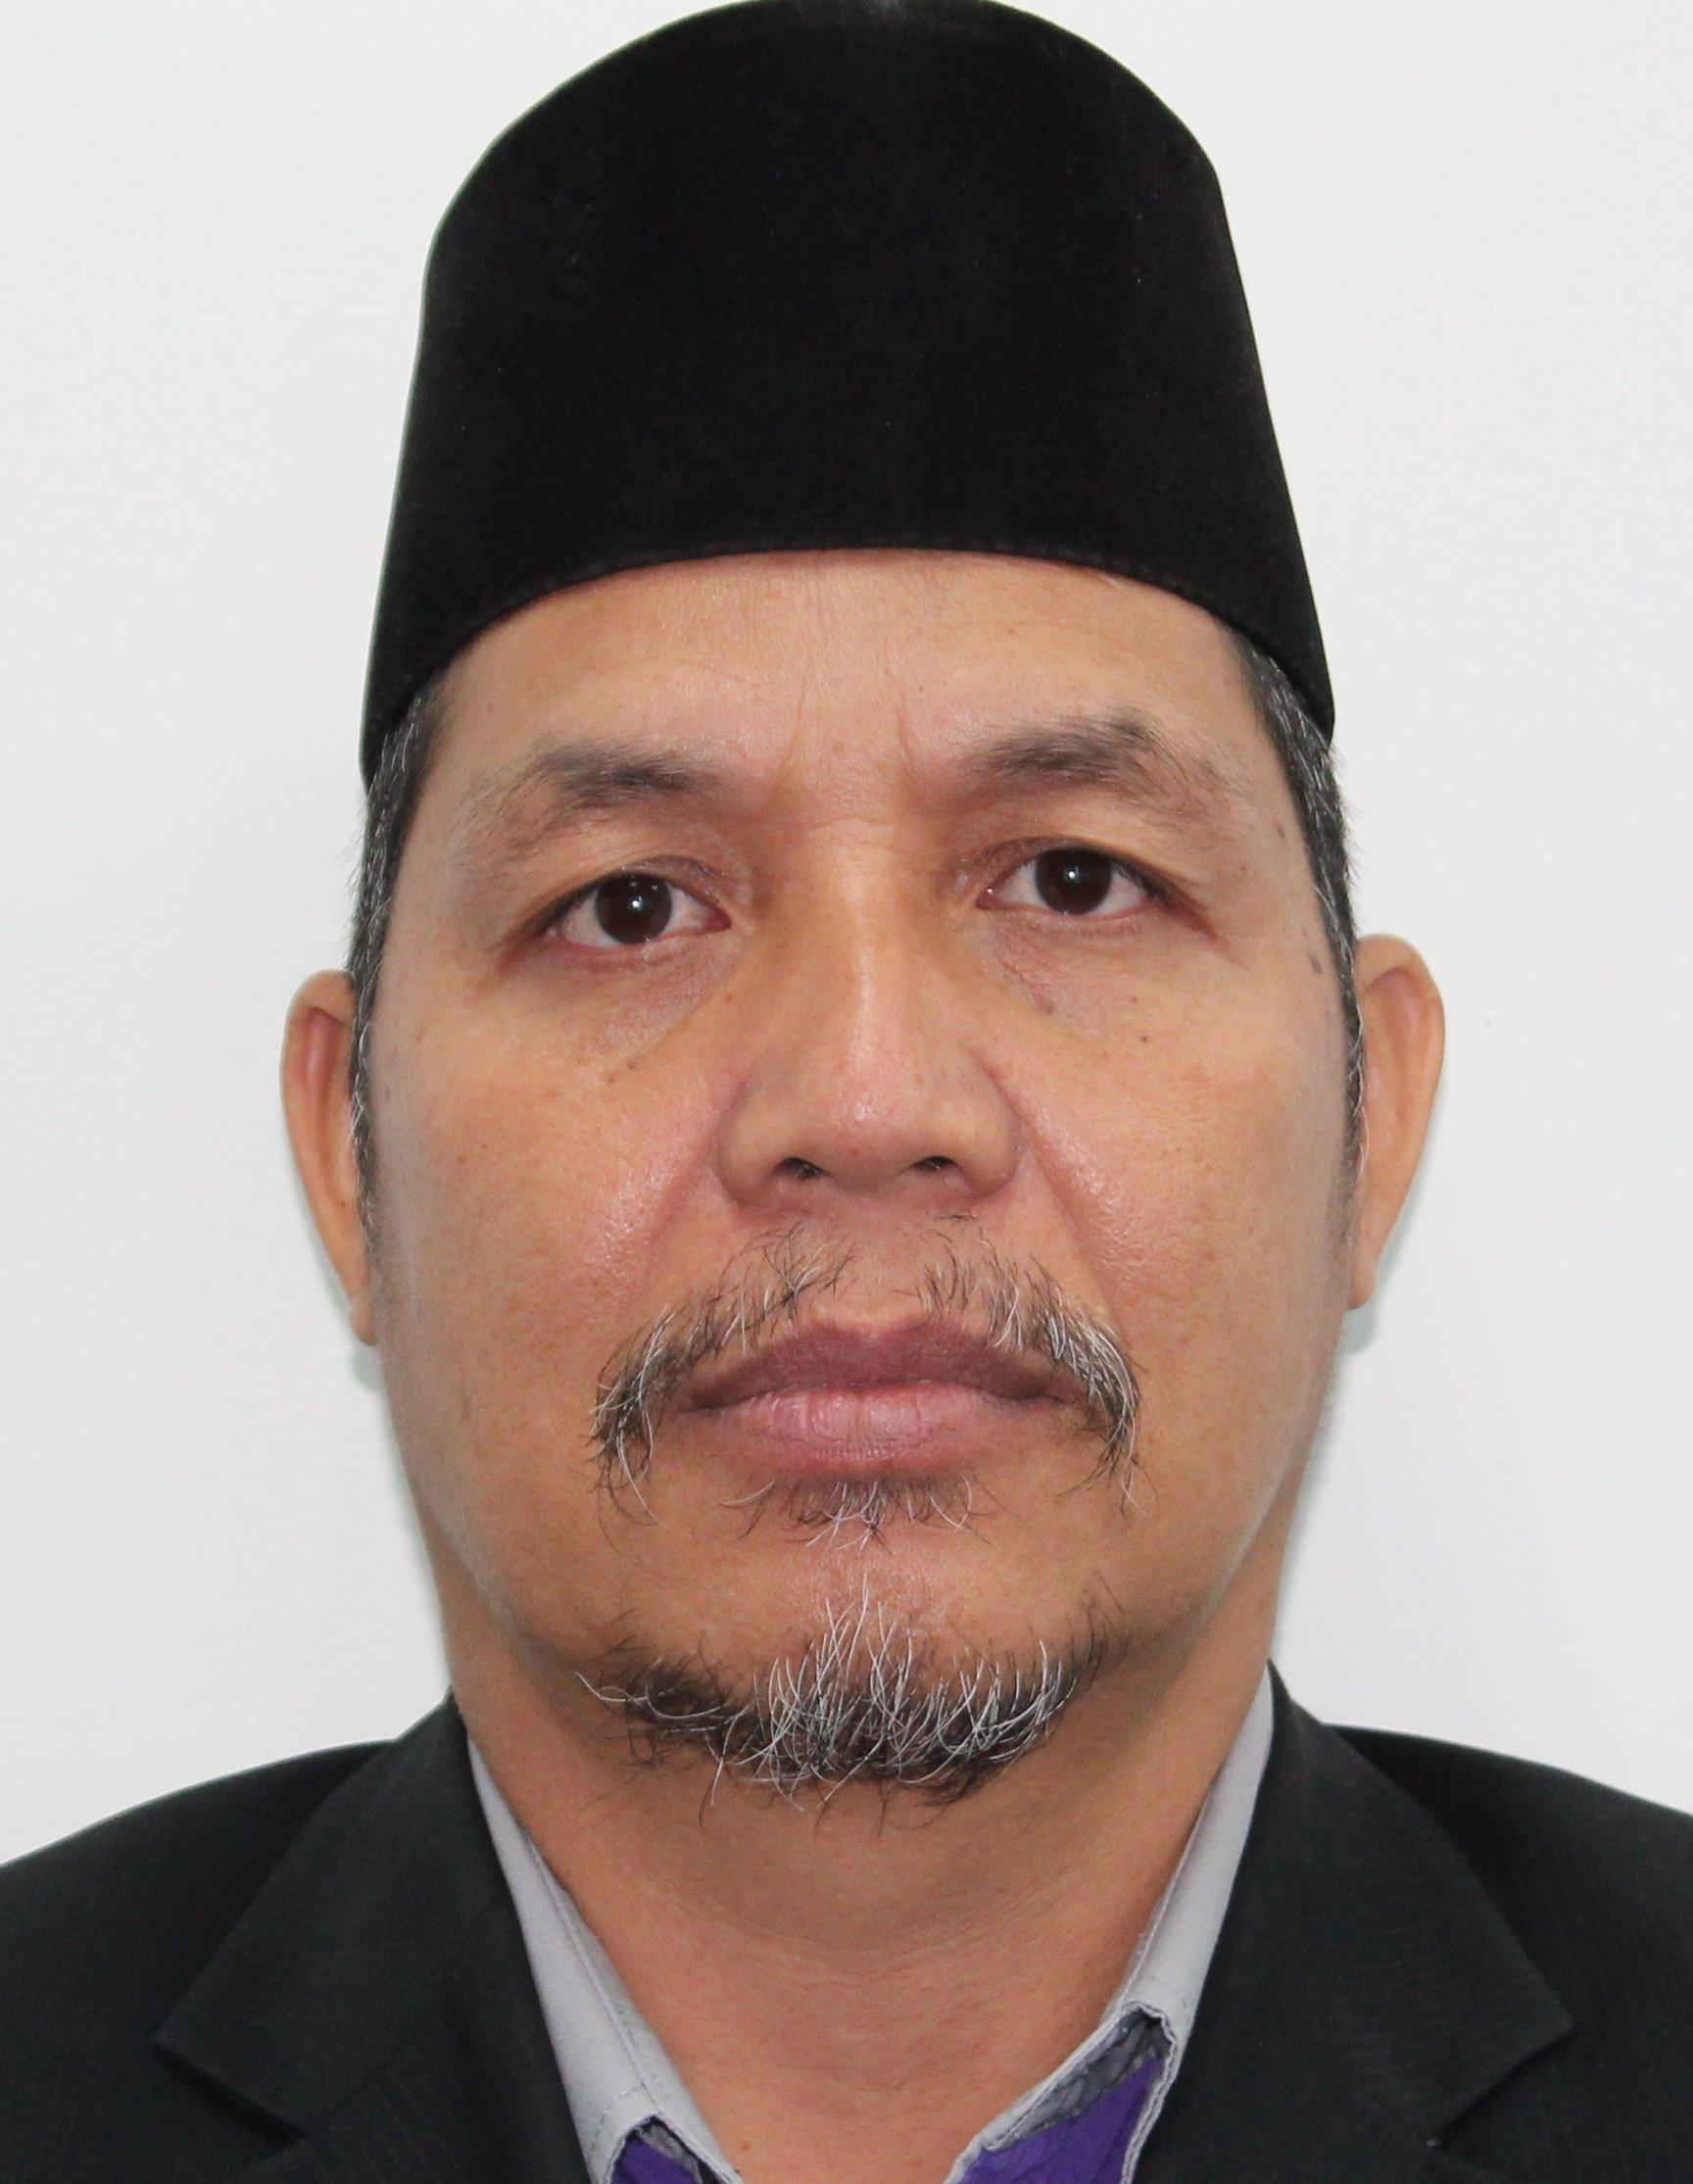 Abdul Mutalib Bin Abdullah